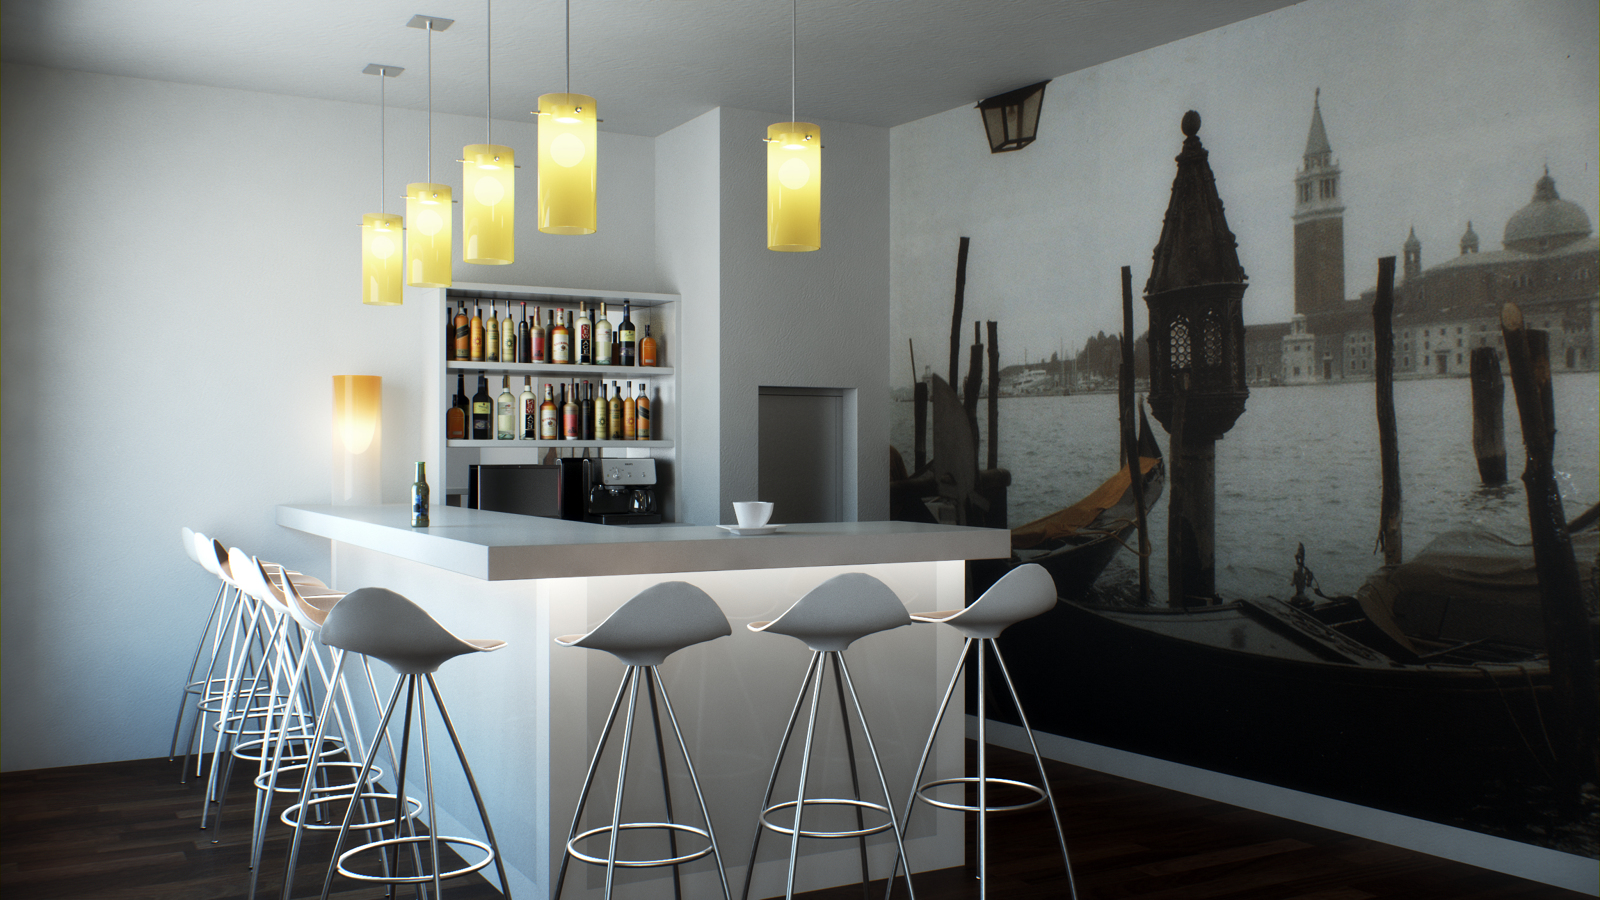 Foto restaurante mediterraneo de estudio 5s 281238 habitissimo - Muebles arroyo ceuta ...